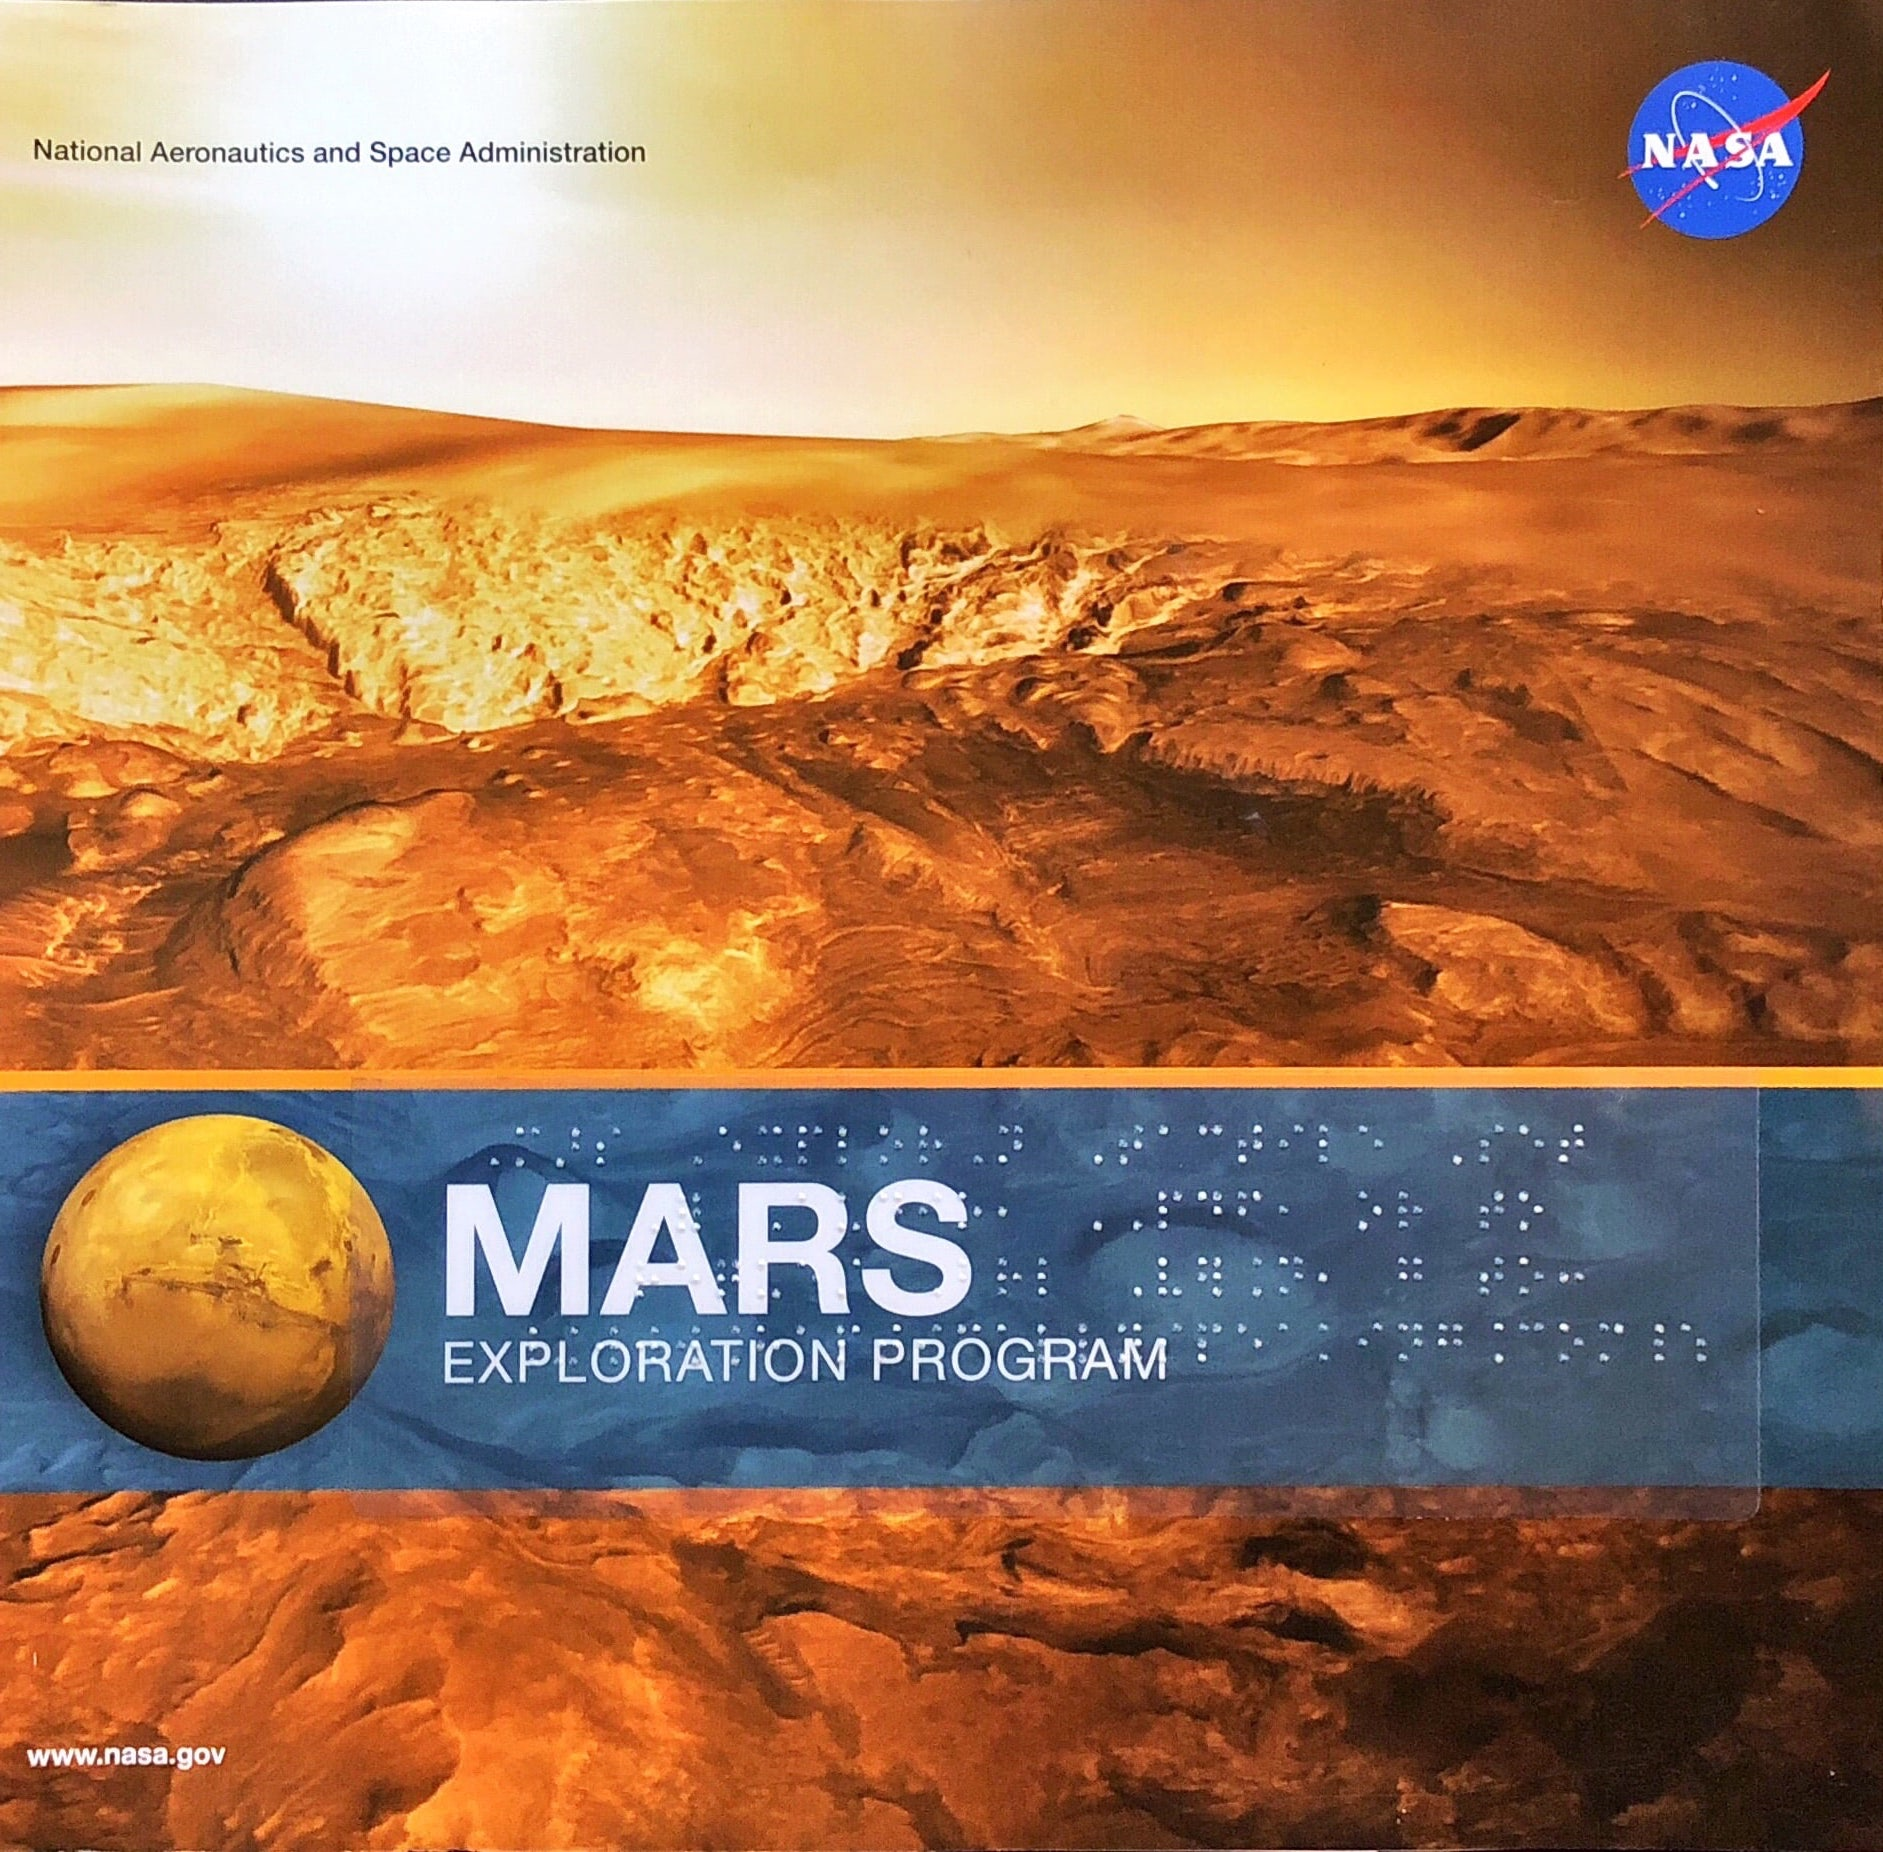 mars rover book - photo #29